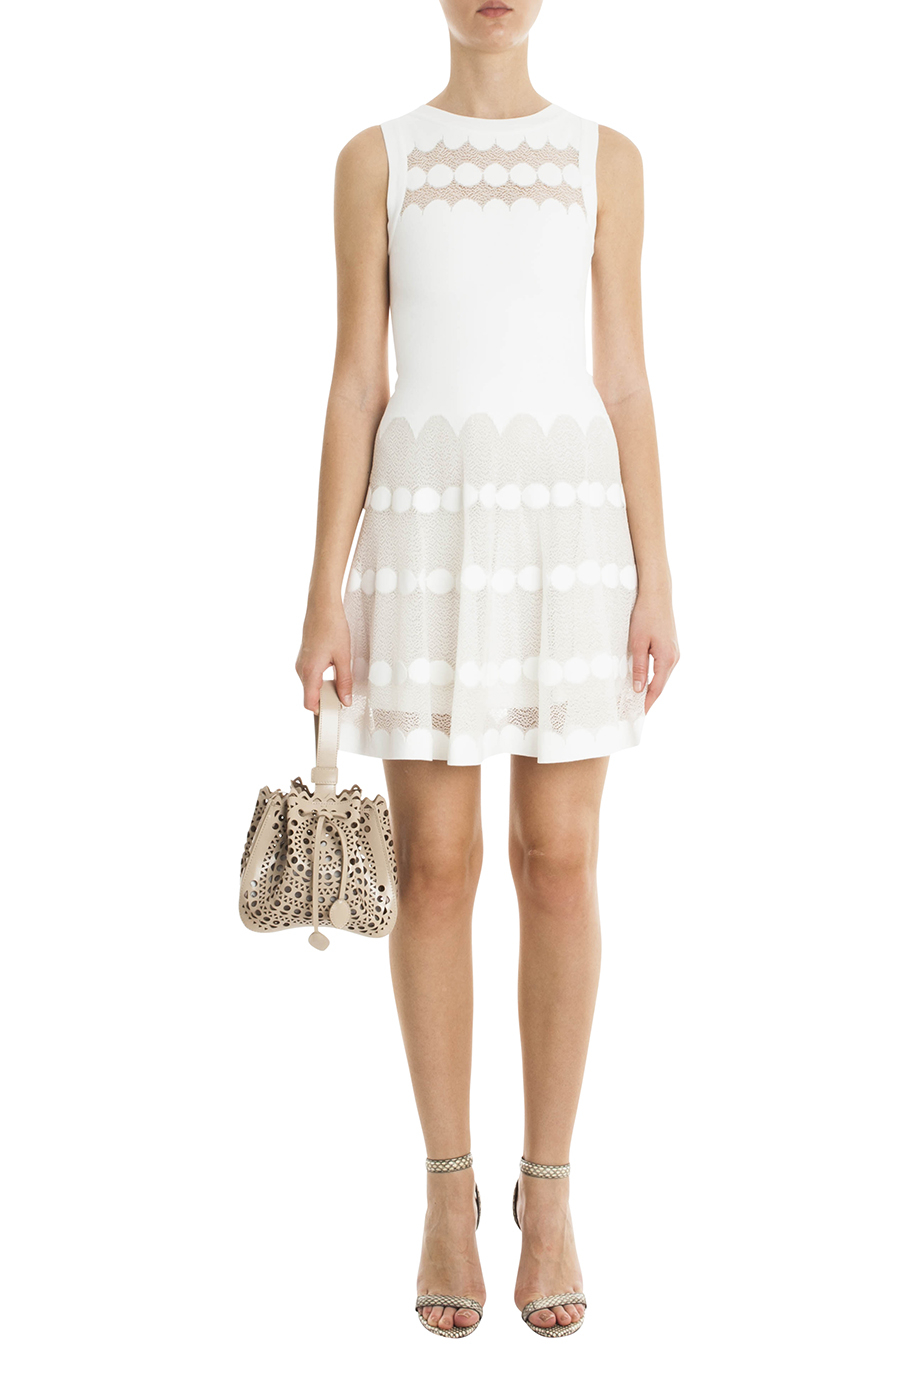 3881feda42d Alaïa Polka Dot Dress in White - Lyst